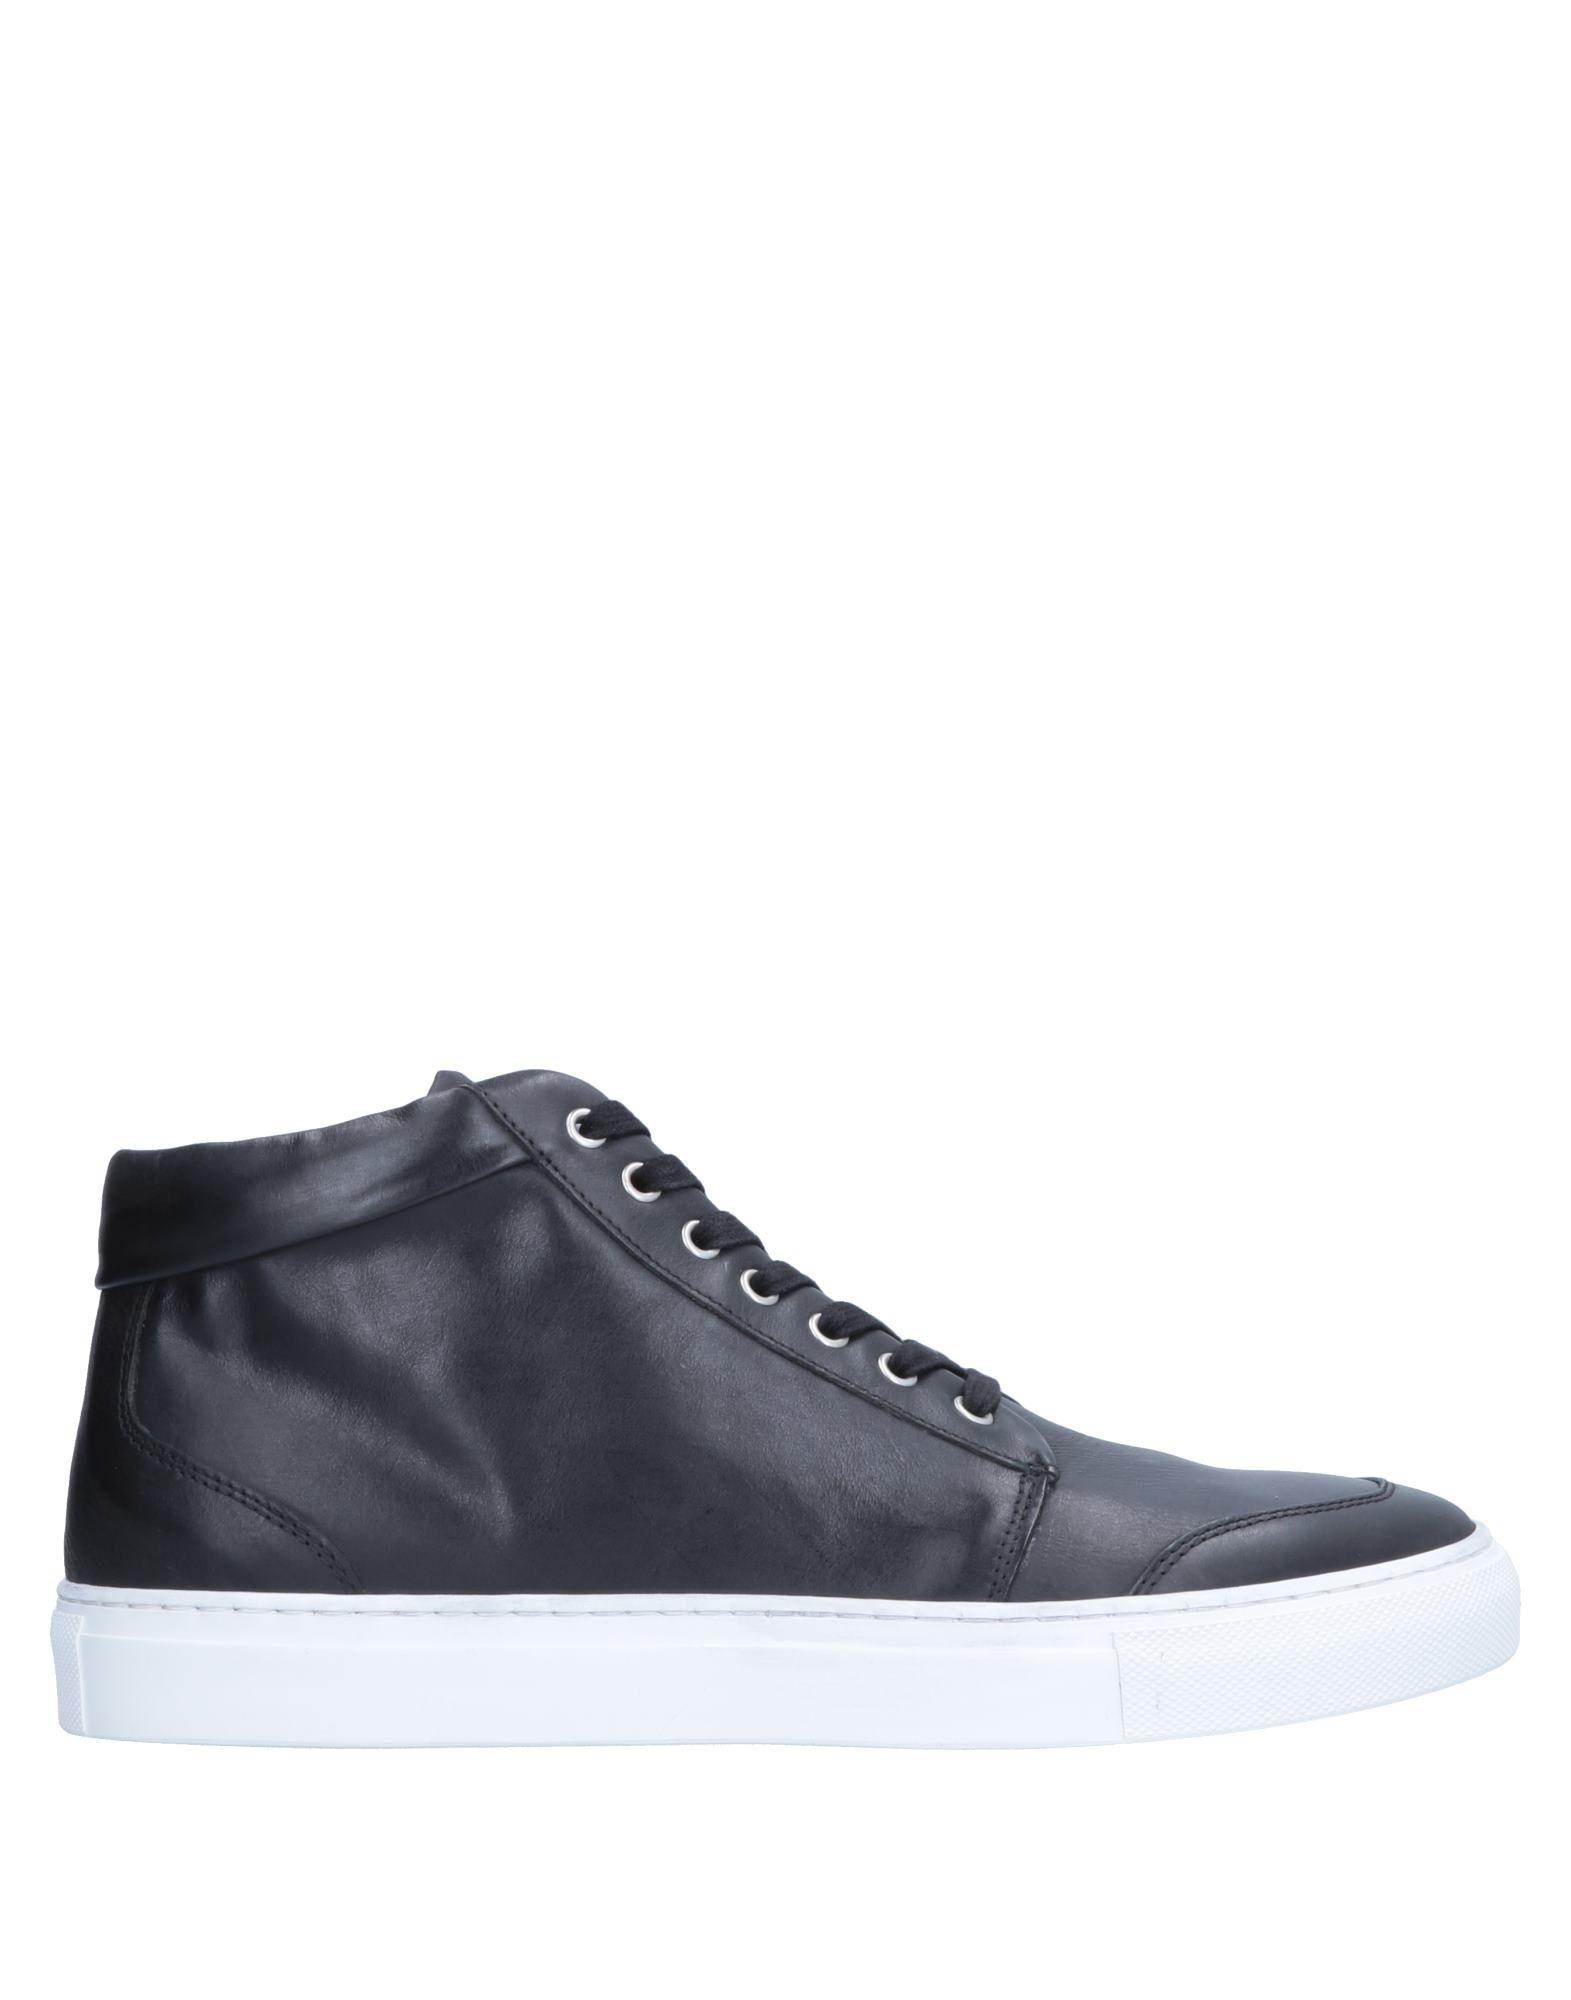 Fabiano Ricci Gute Sneakers Herren  11546937BE Gute Ricci Qualität beliebte Schuhe 5050fd